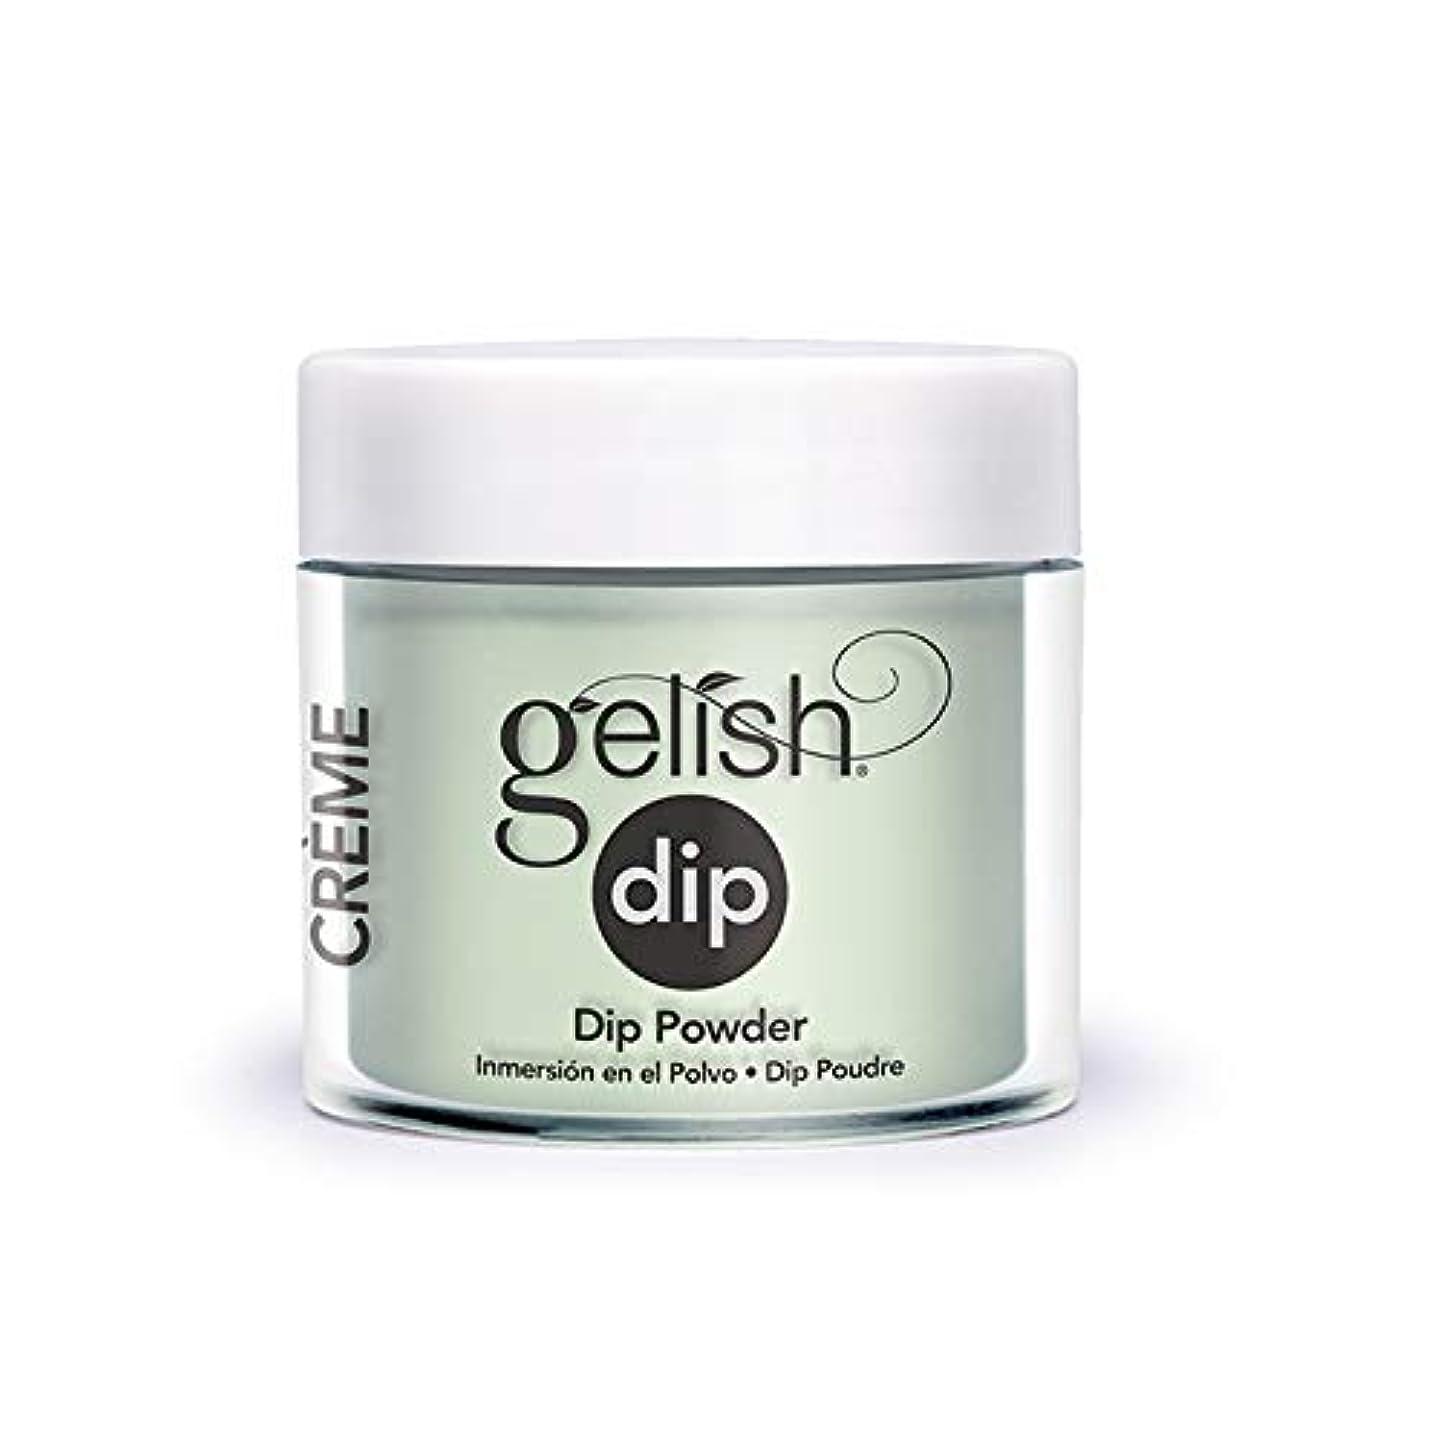 人間必要条件論理的にHarmony Gelish - Acrylic Dip Powder - Mint Chocolate Chip - 23g / 0.8oz